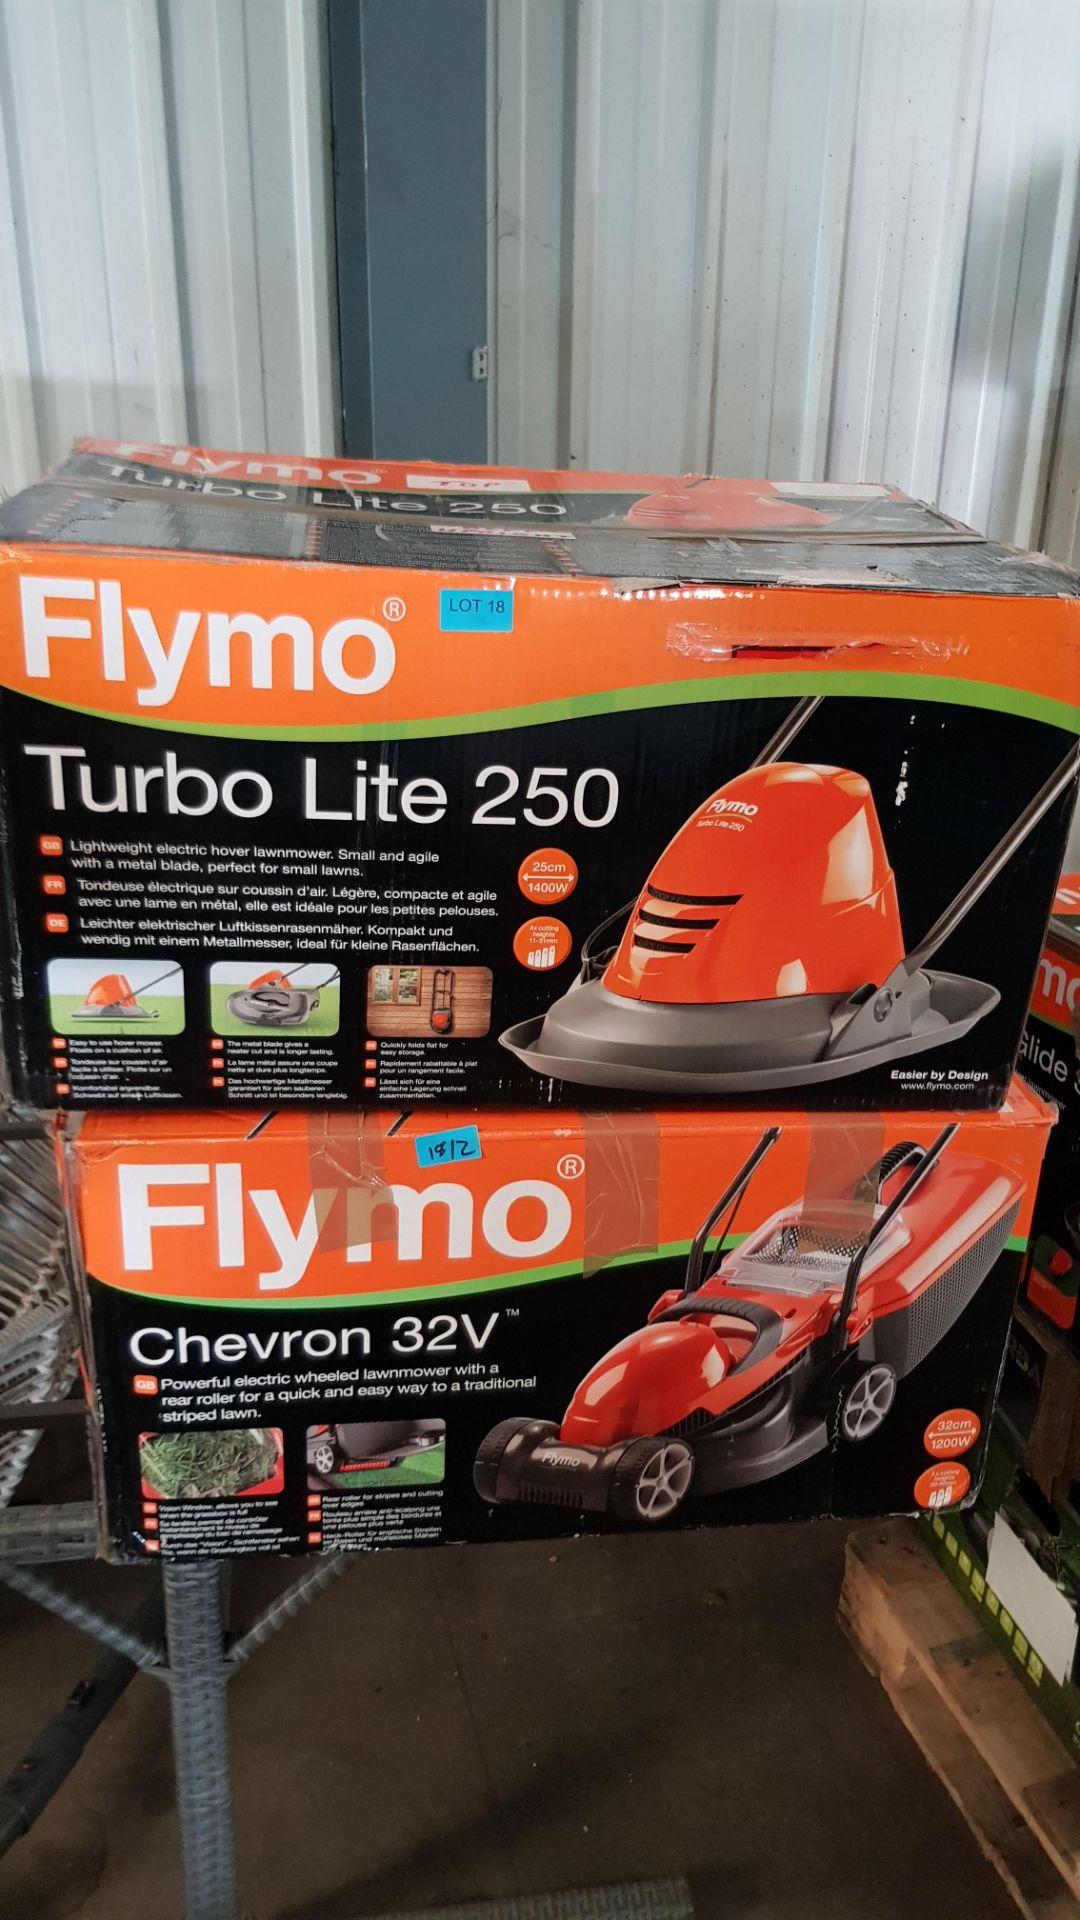 (P9) 2x Flymo Items. 1x Turbo Lite 250, 1x Chevron 32V. - Image 3 of 3